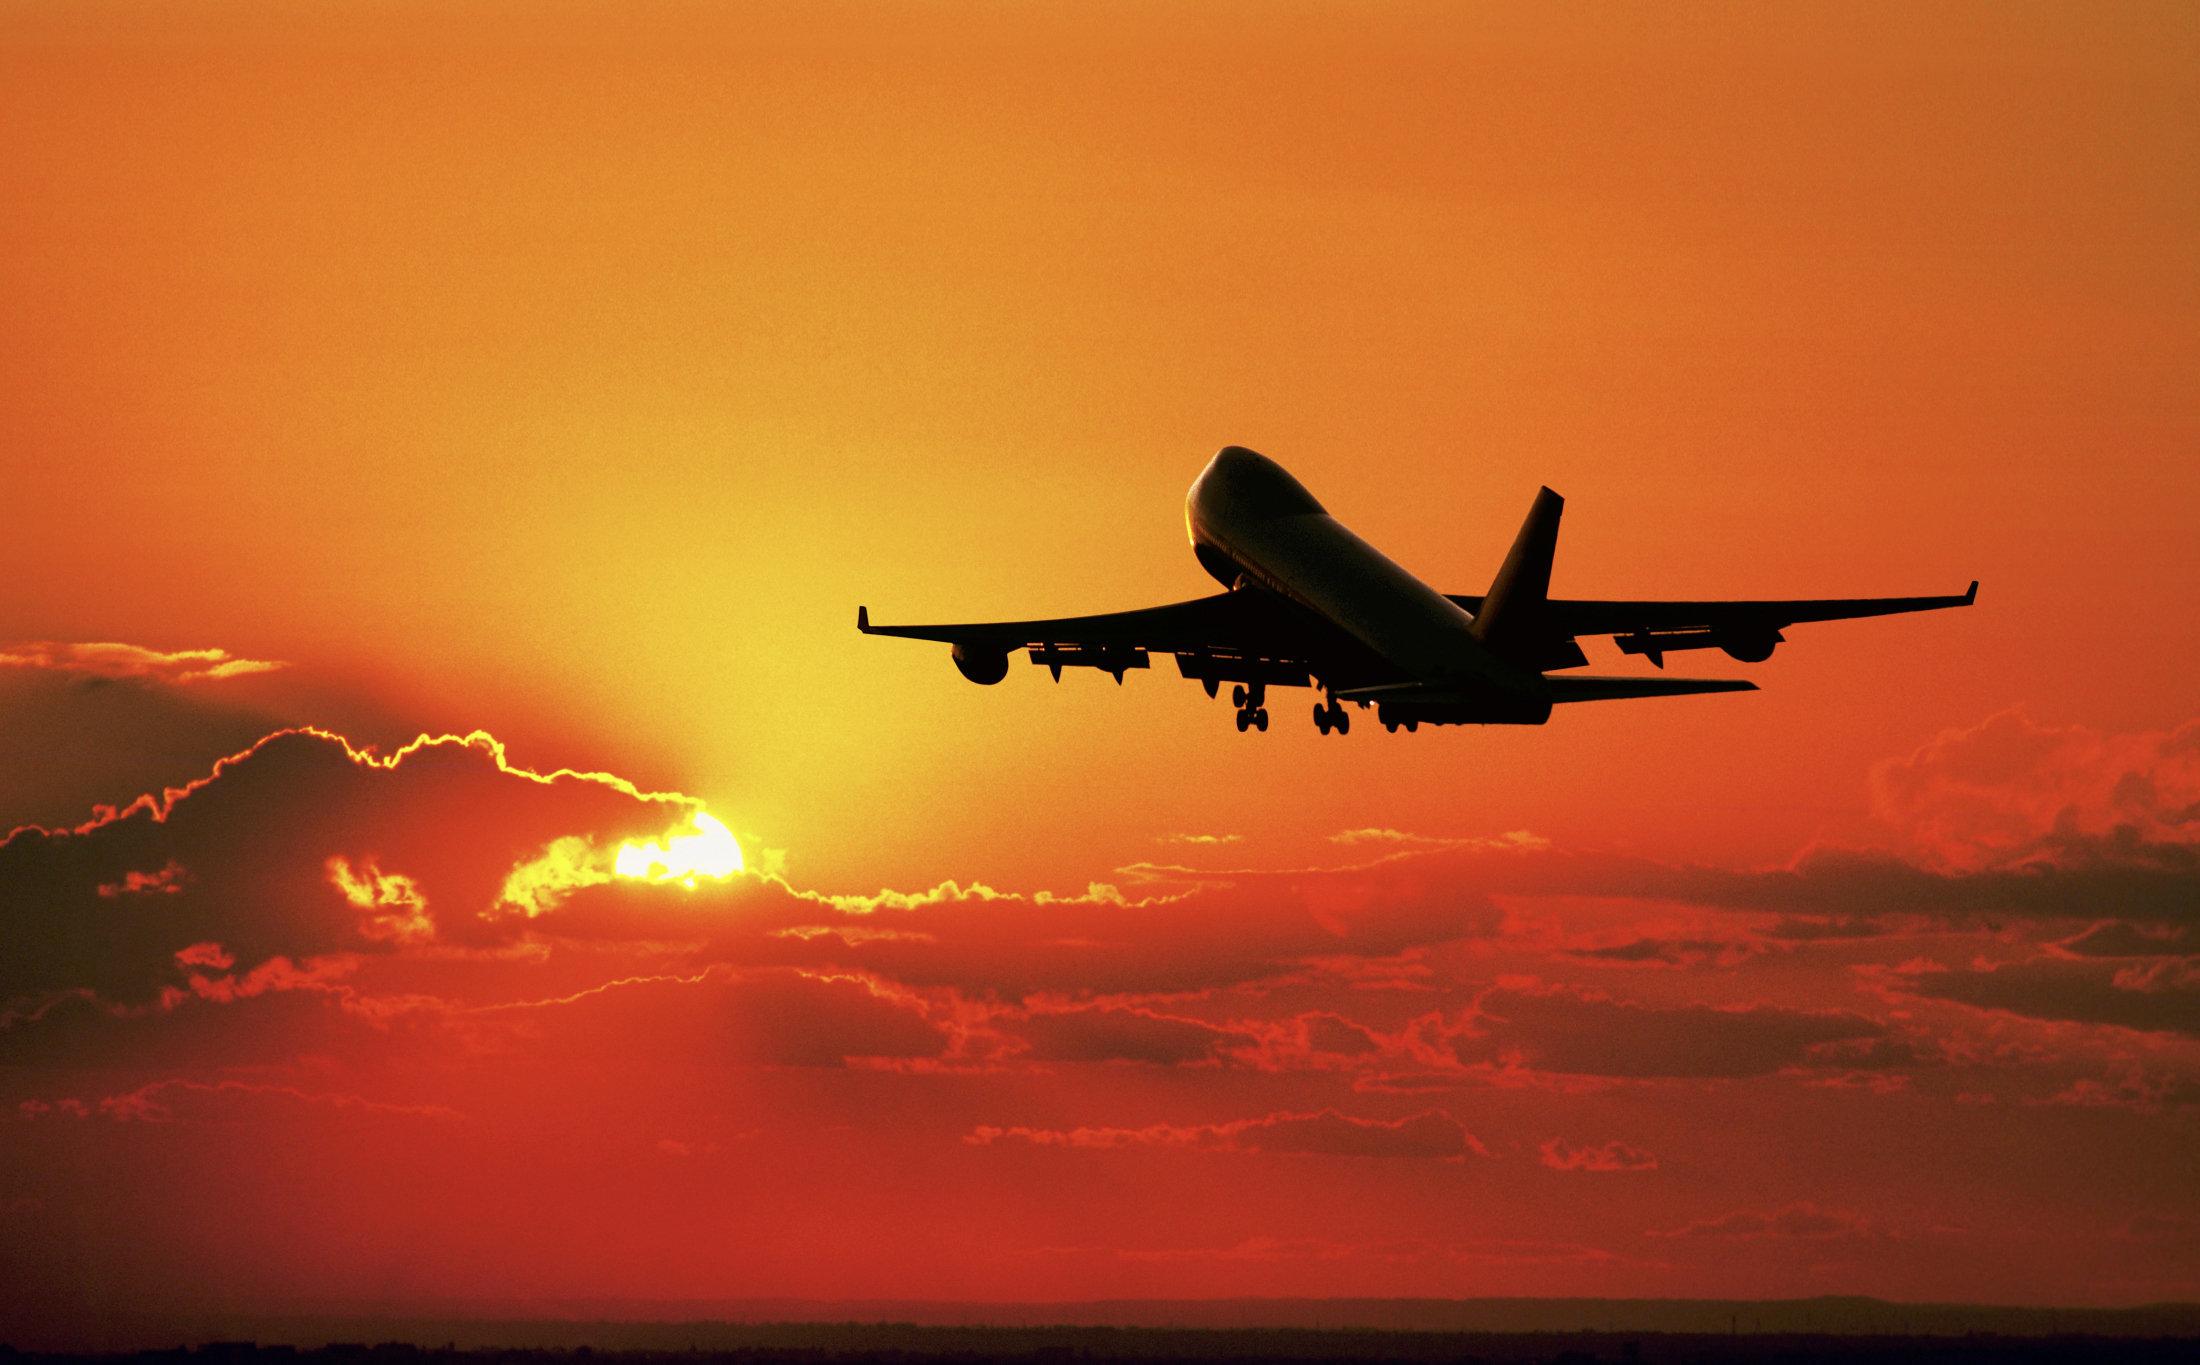 Passenger jet airplane taking off at dusk